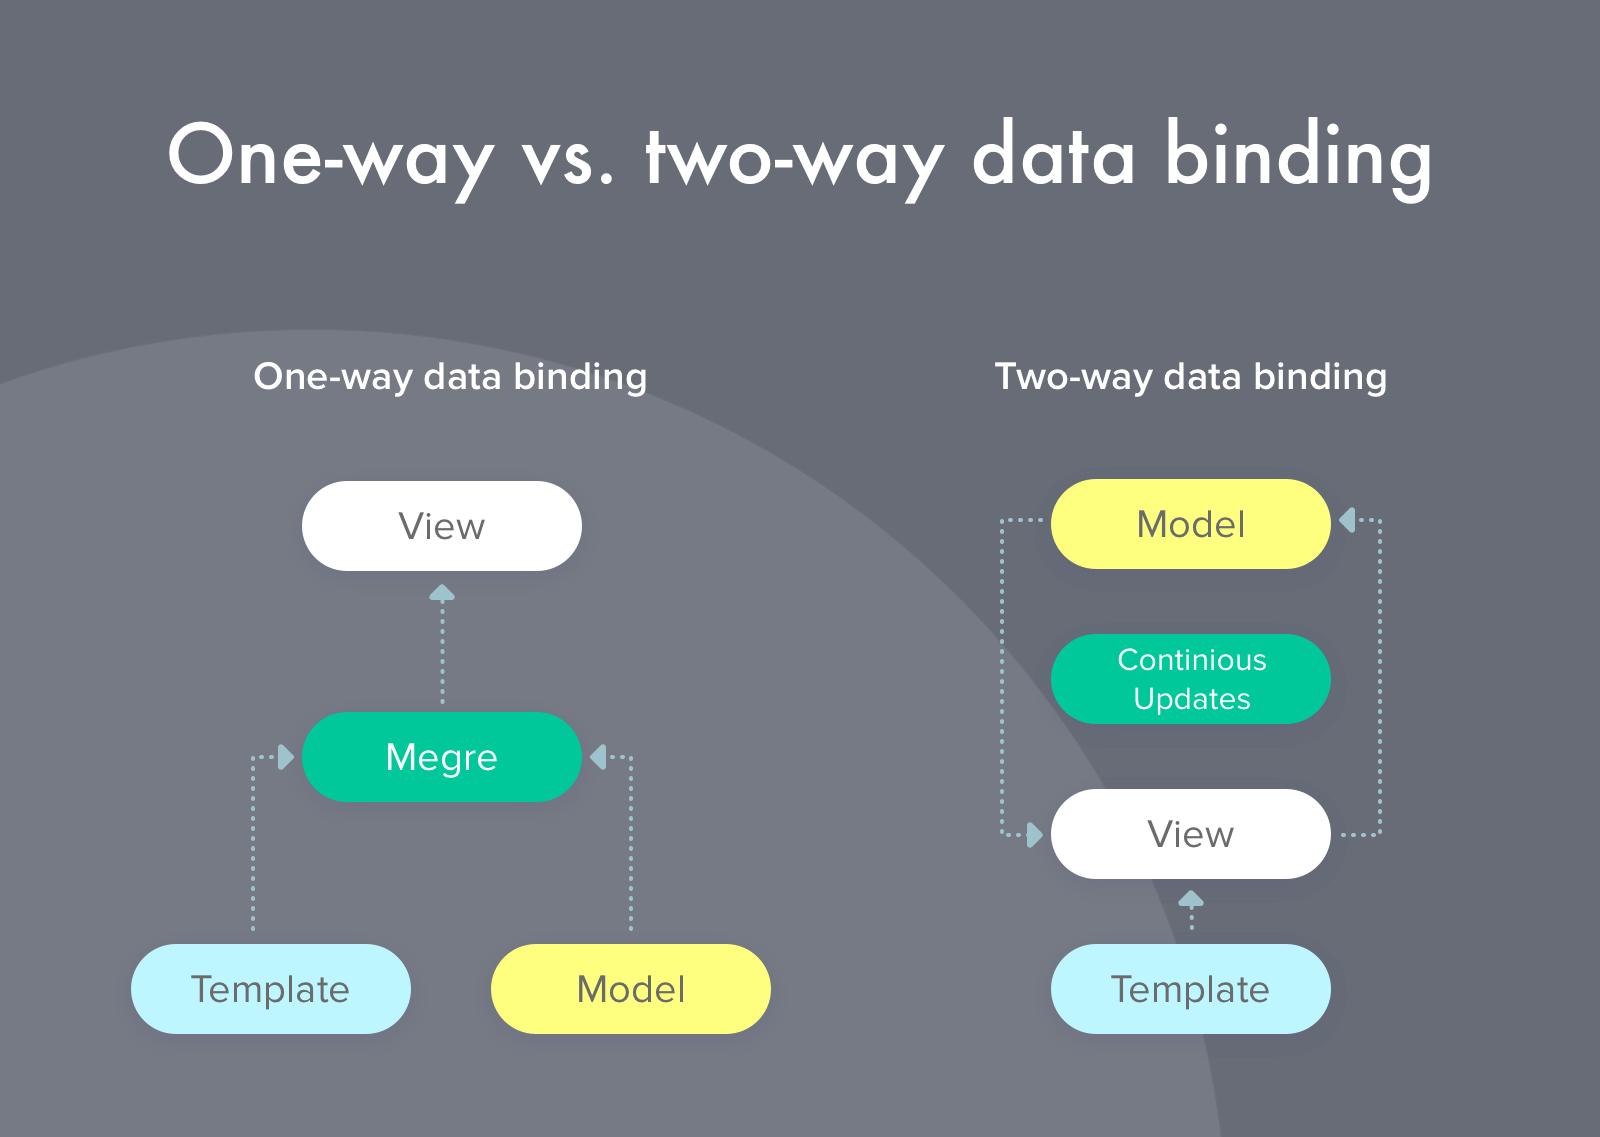 One-way vs Two-way Data Binding